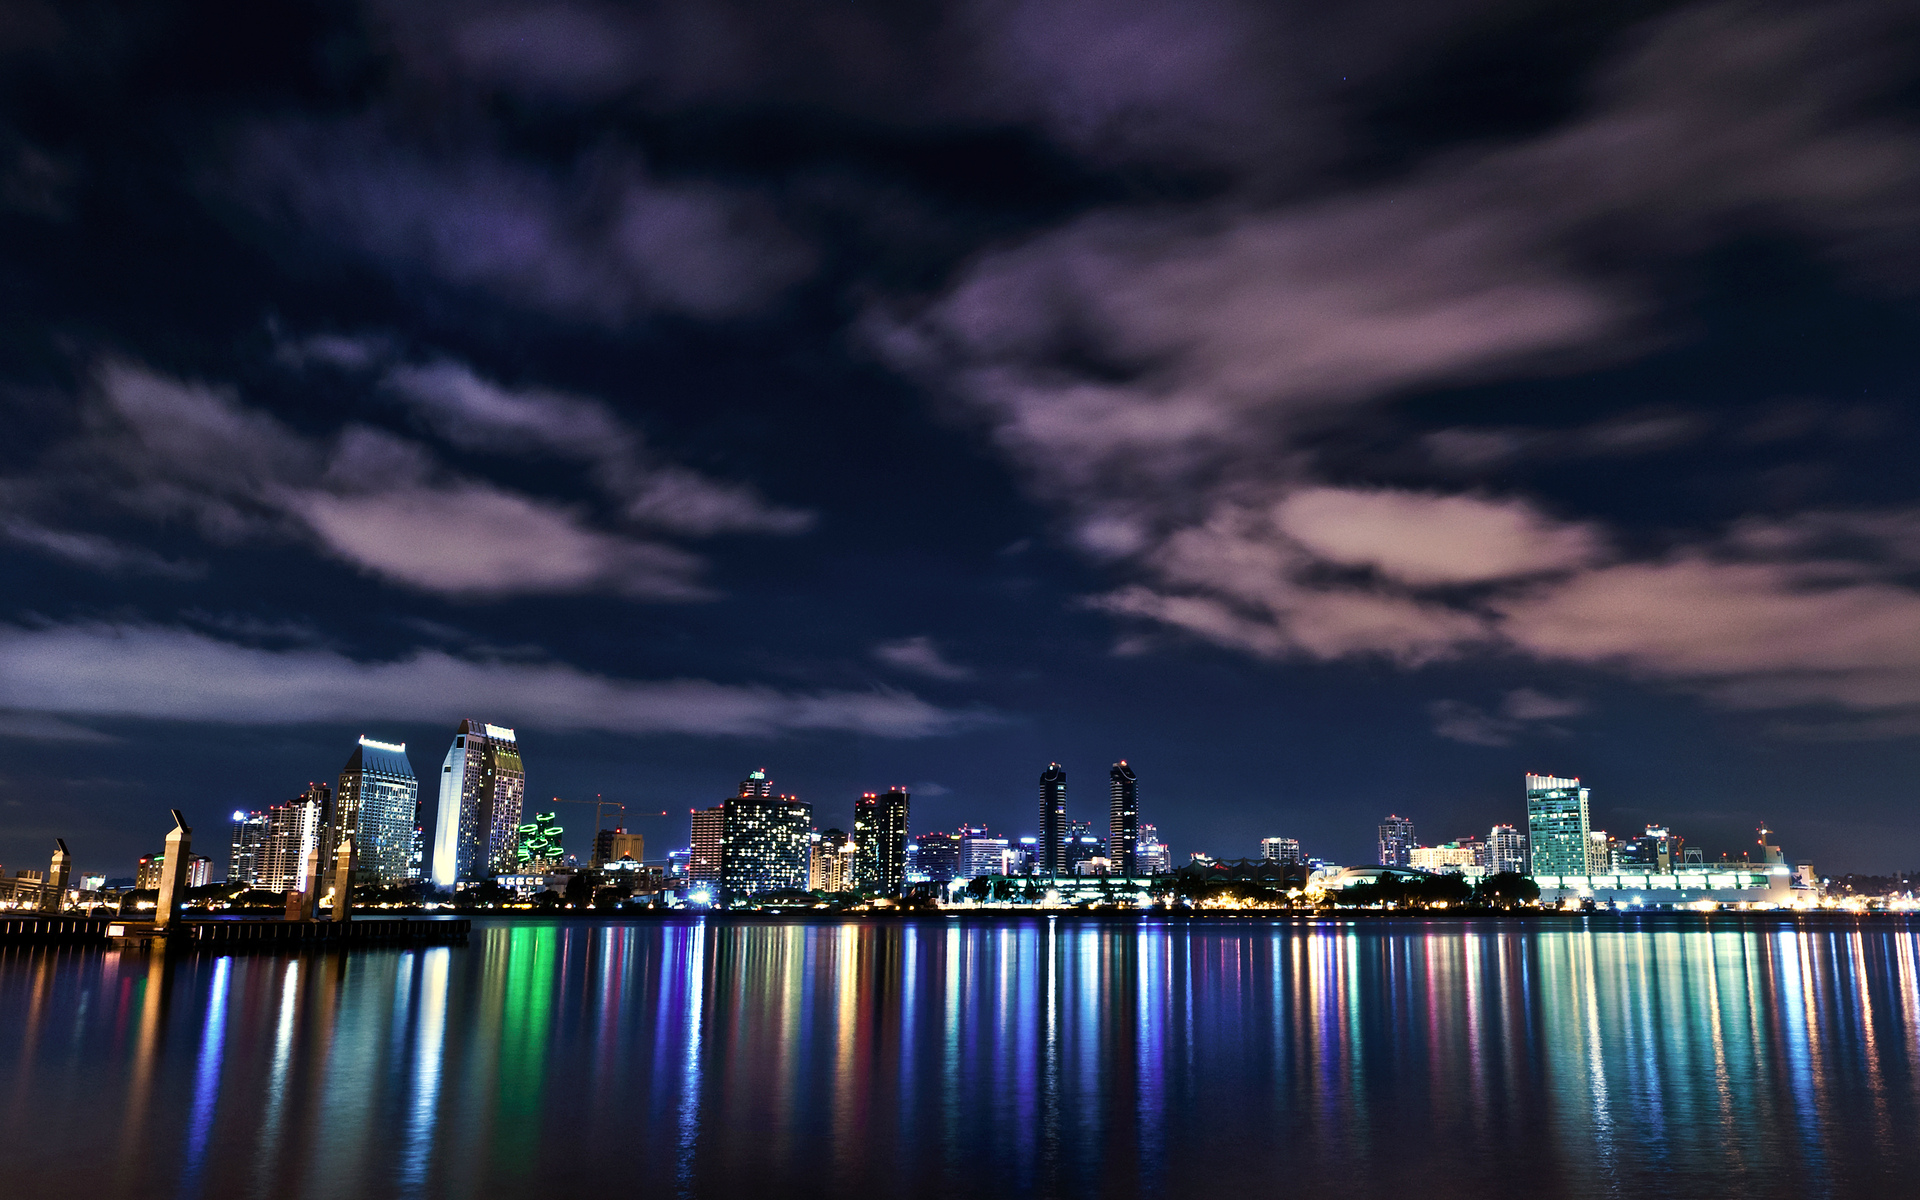 water clouds cityscapes futuristic - photo #35